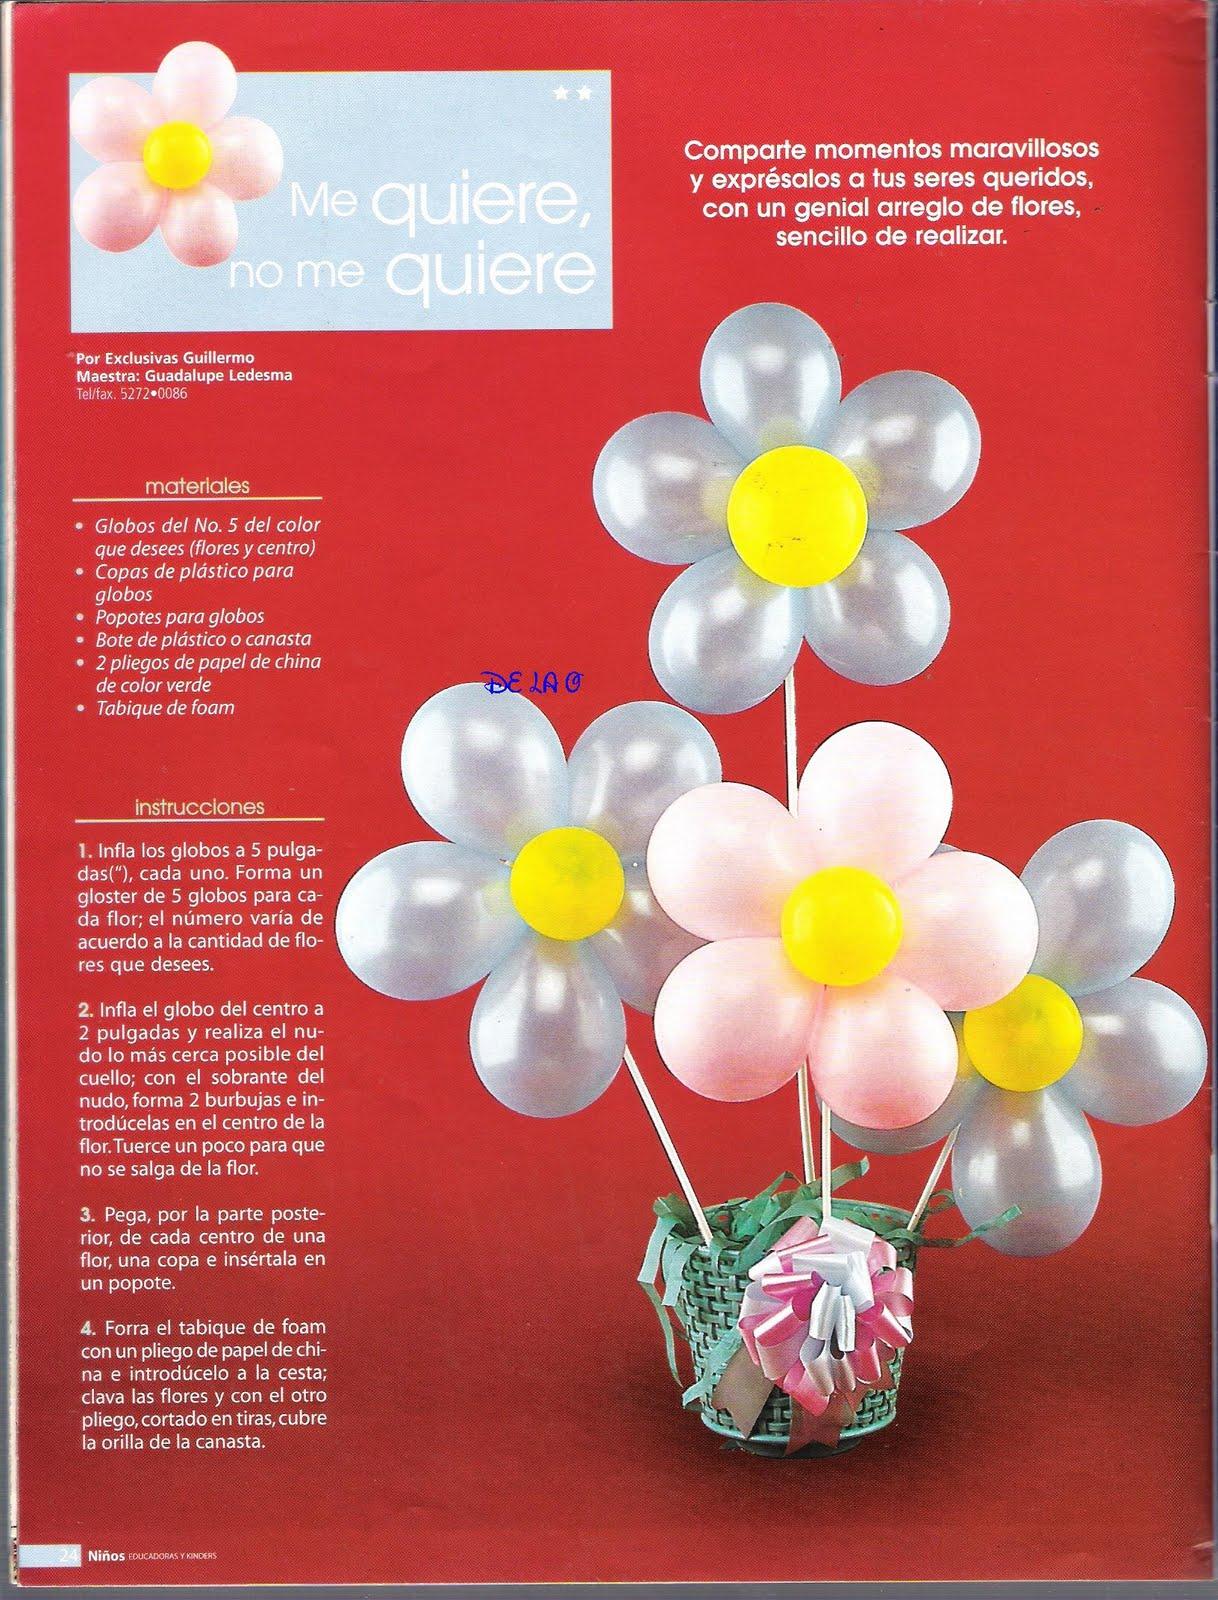 decorando con globos como se hace e ideas decorativas variadas - Como Hacer Flores Con Globos